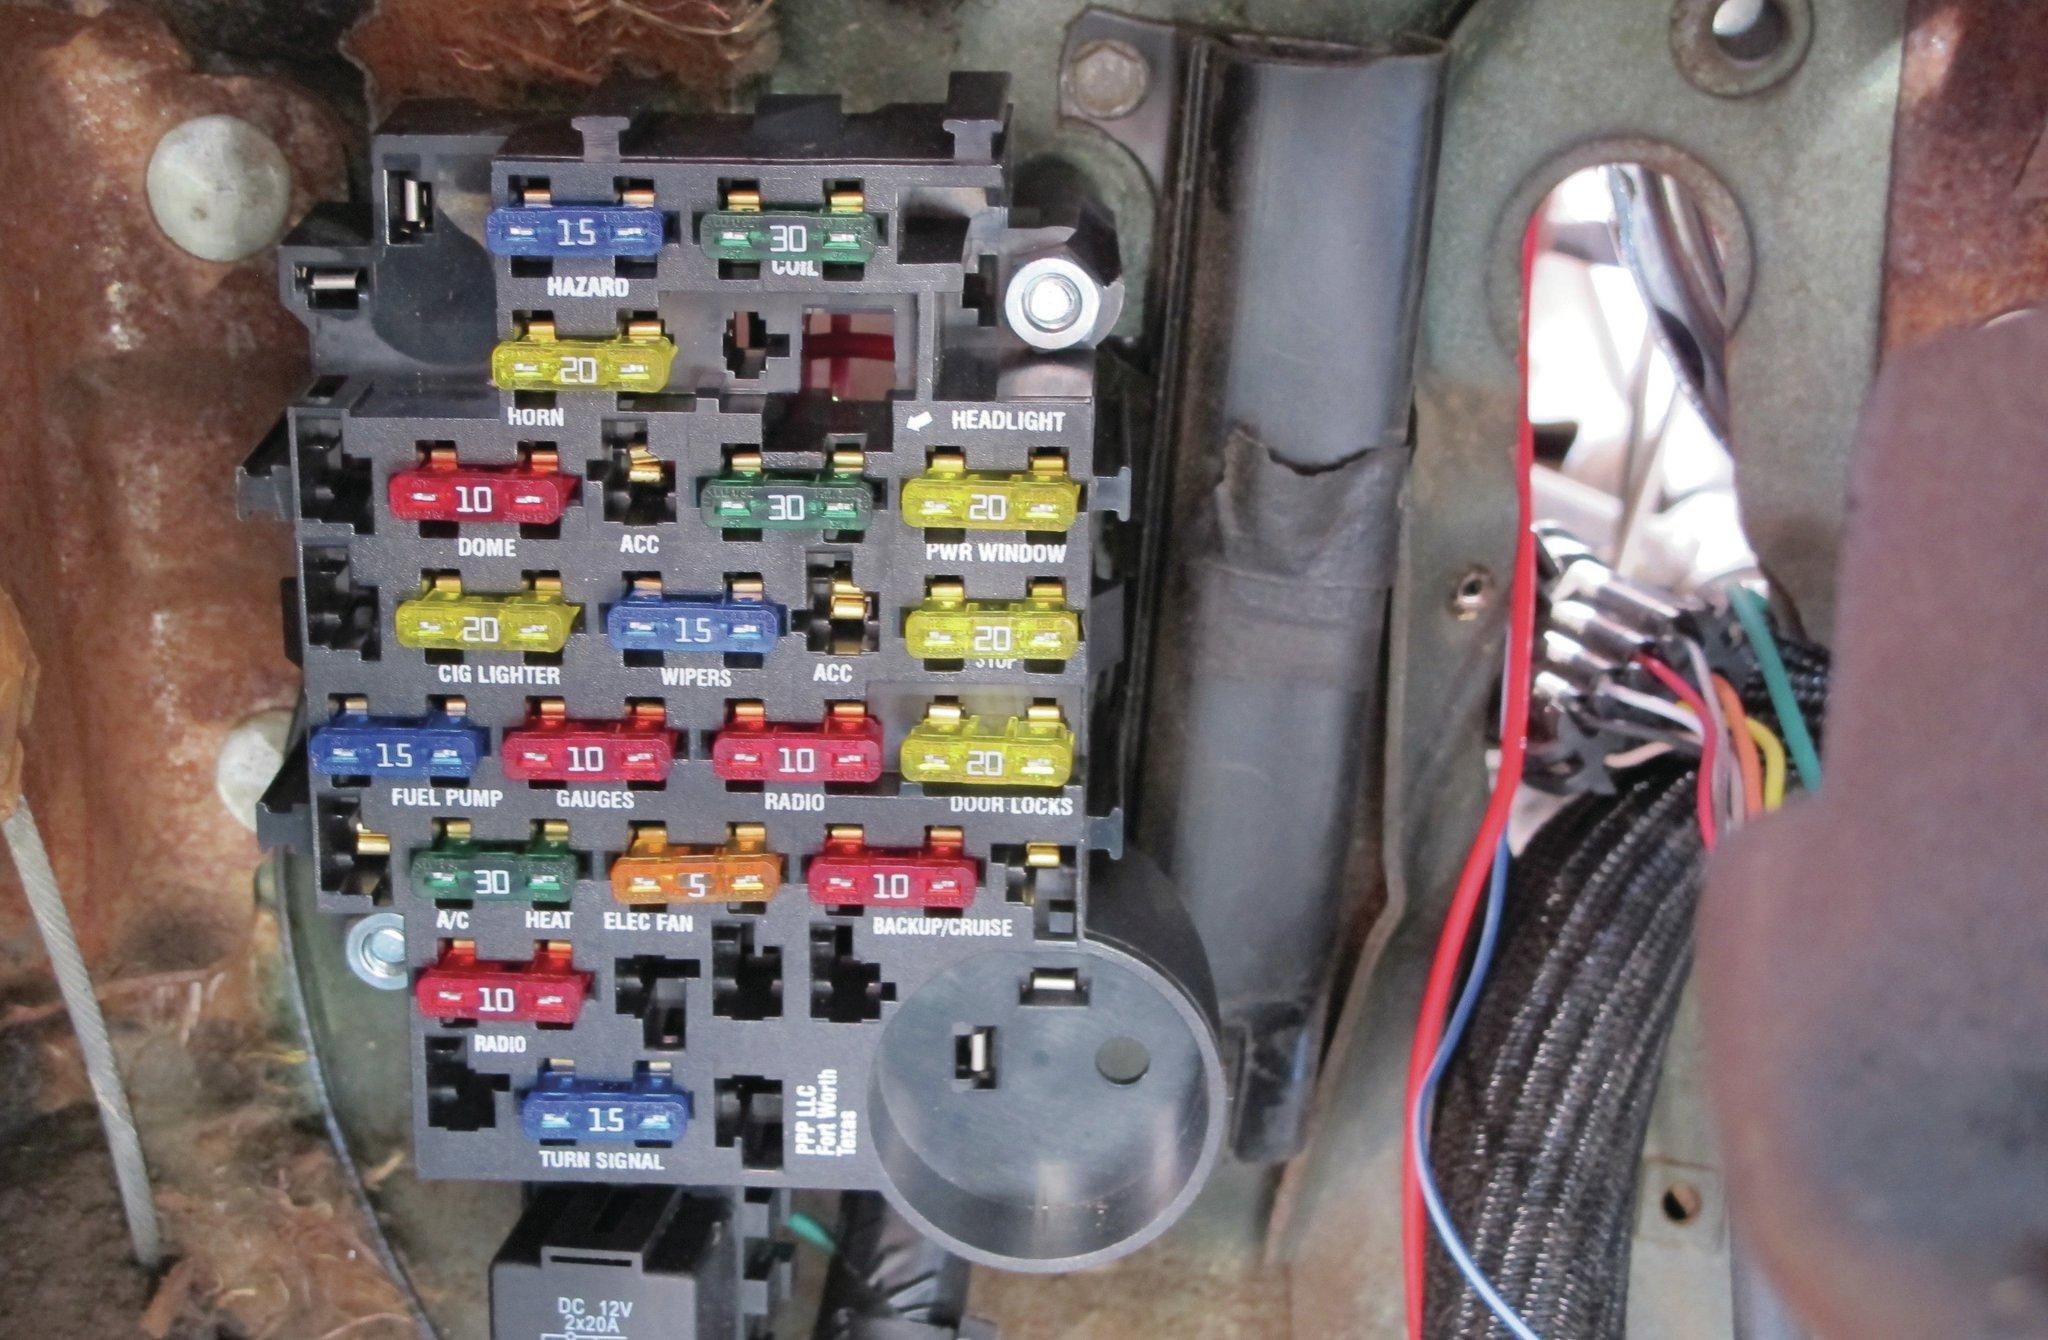 Bk 6116 Pontiac Fiero Headlight Wiring Diagram On 84 Fiero Wiring Diagram Wiring Diagram